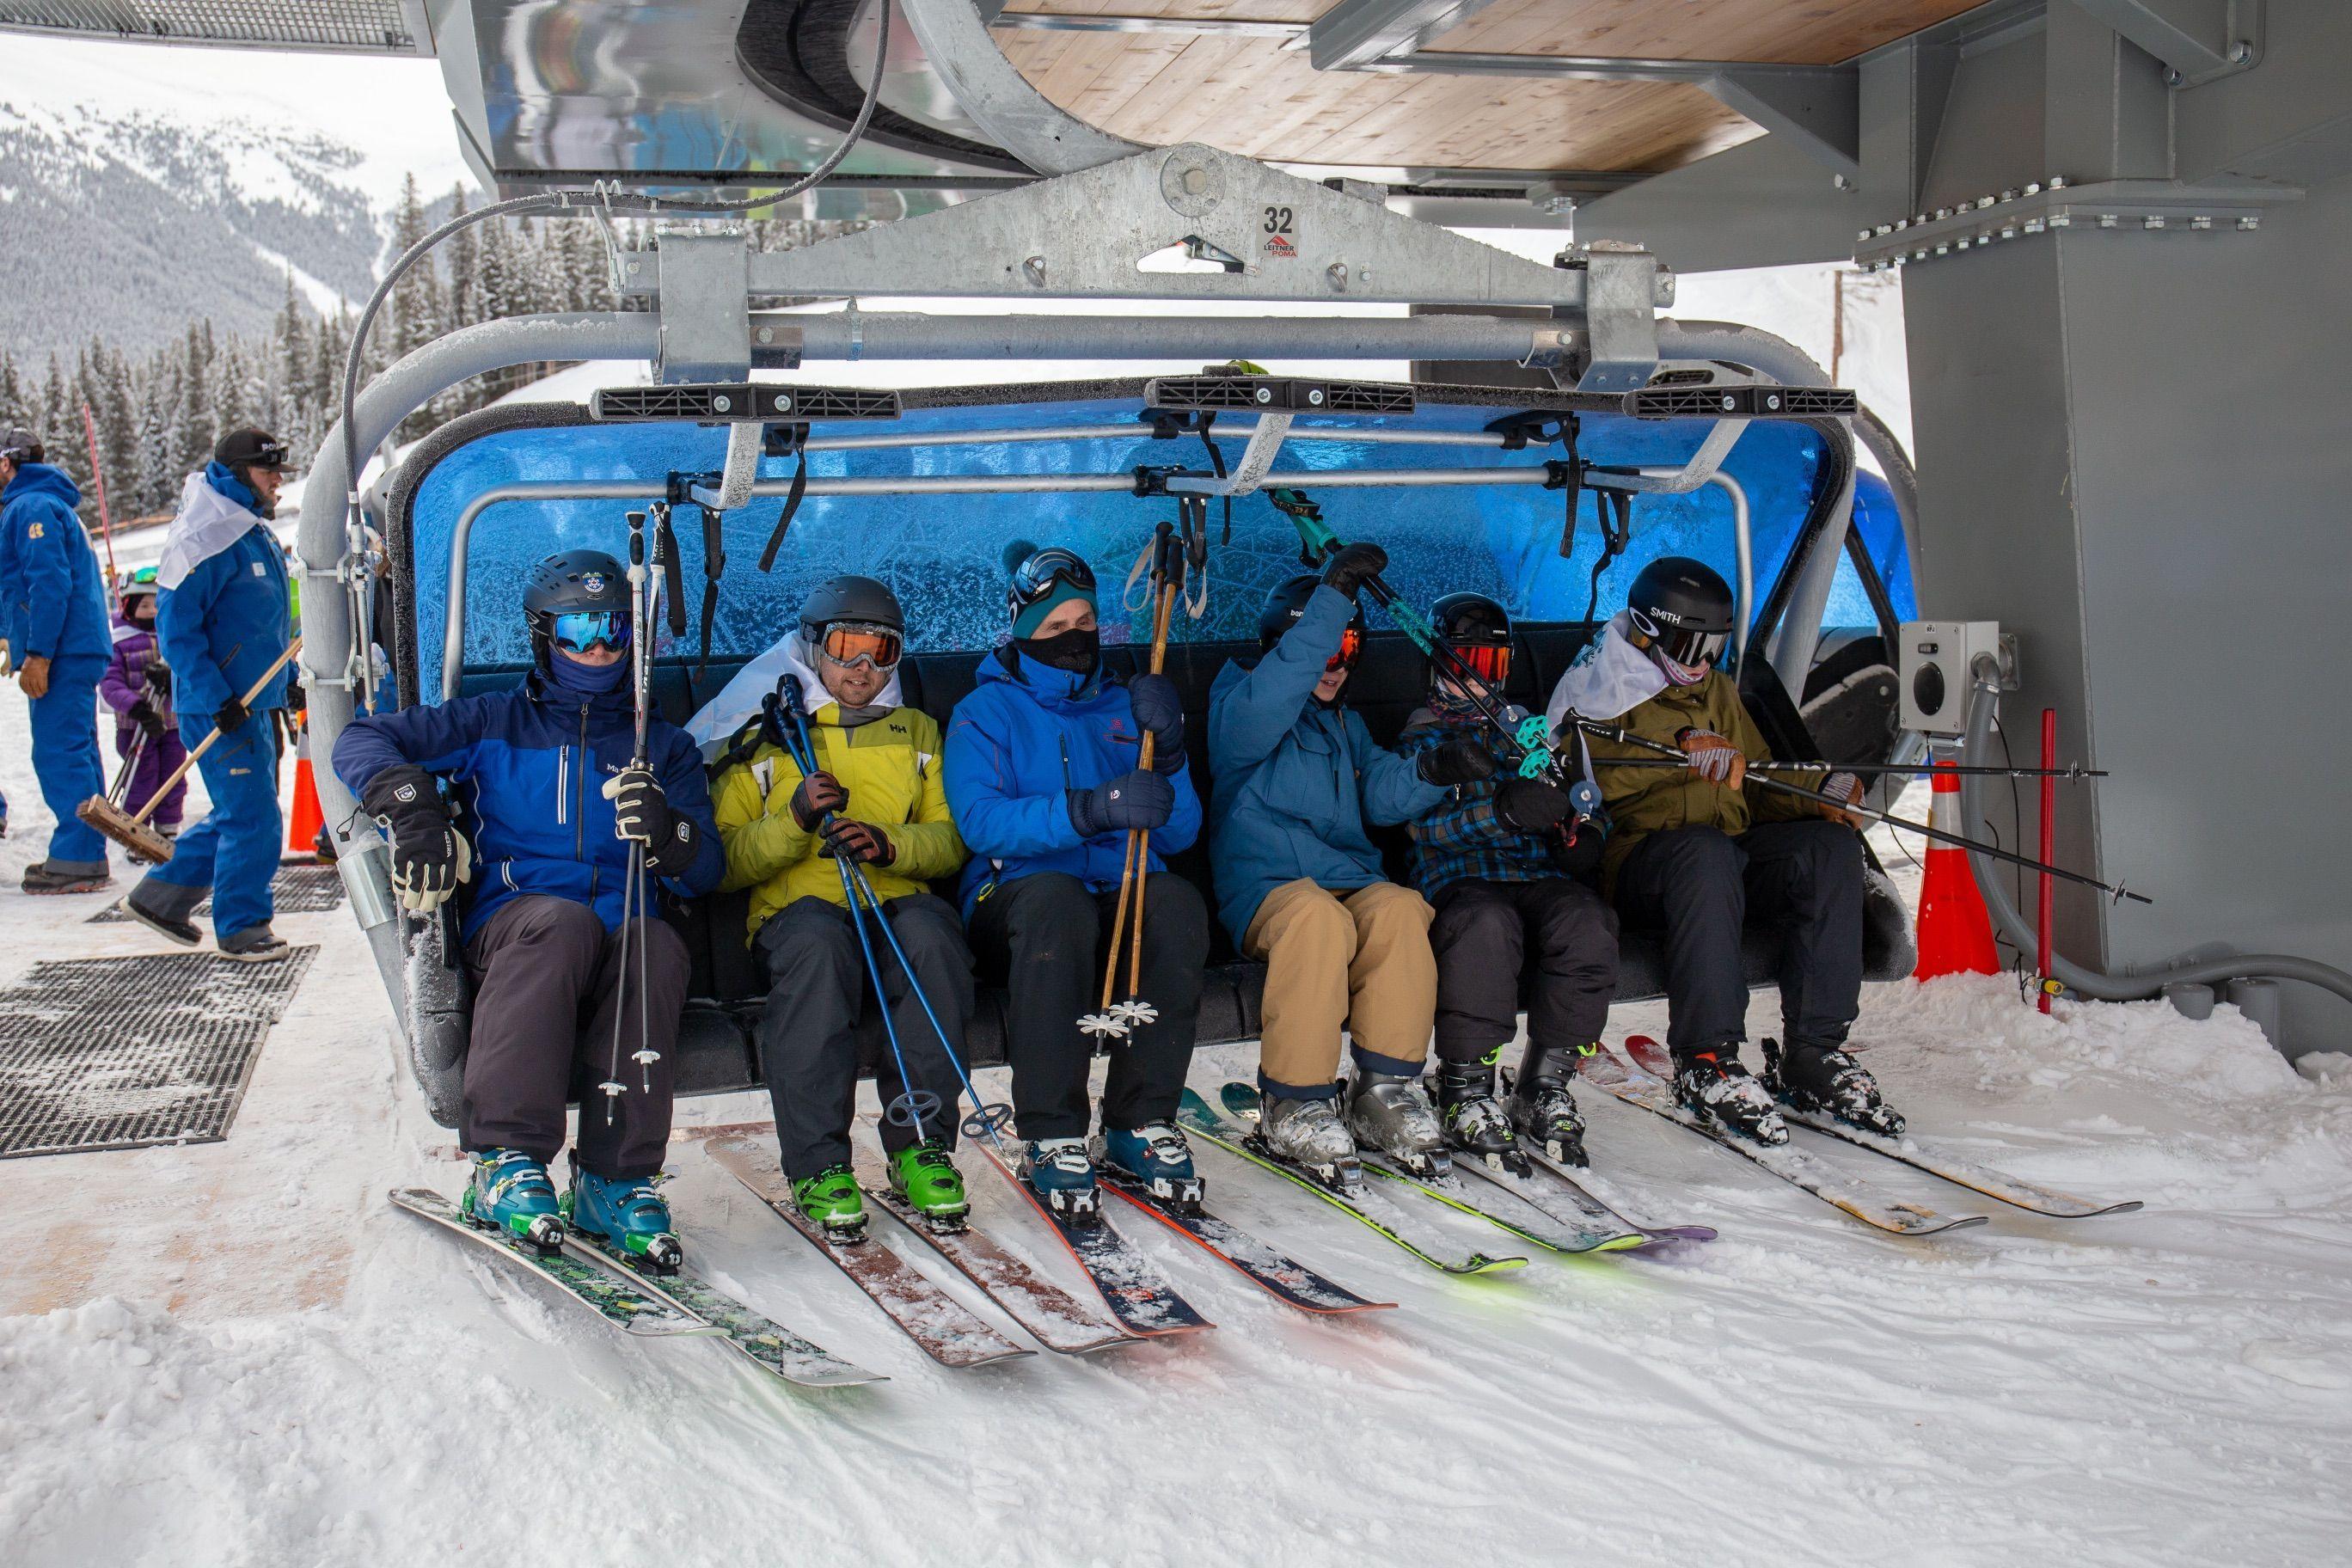 Follow Us On Instagram Click Photo Copper Mountain Ski Resort Lifts And Gondolas Powder Day Photogr Copper Mountain Ski Resort Ski Resort Copper Mountain